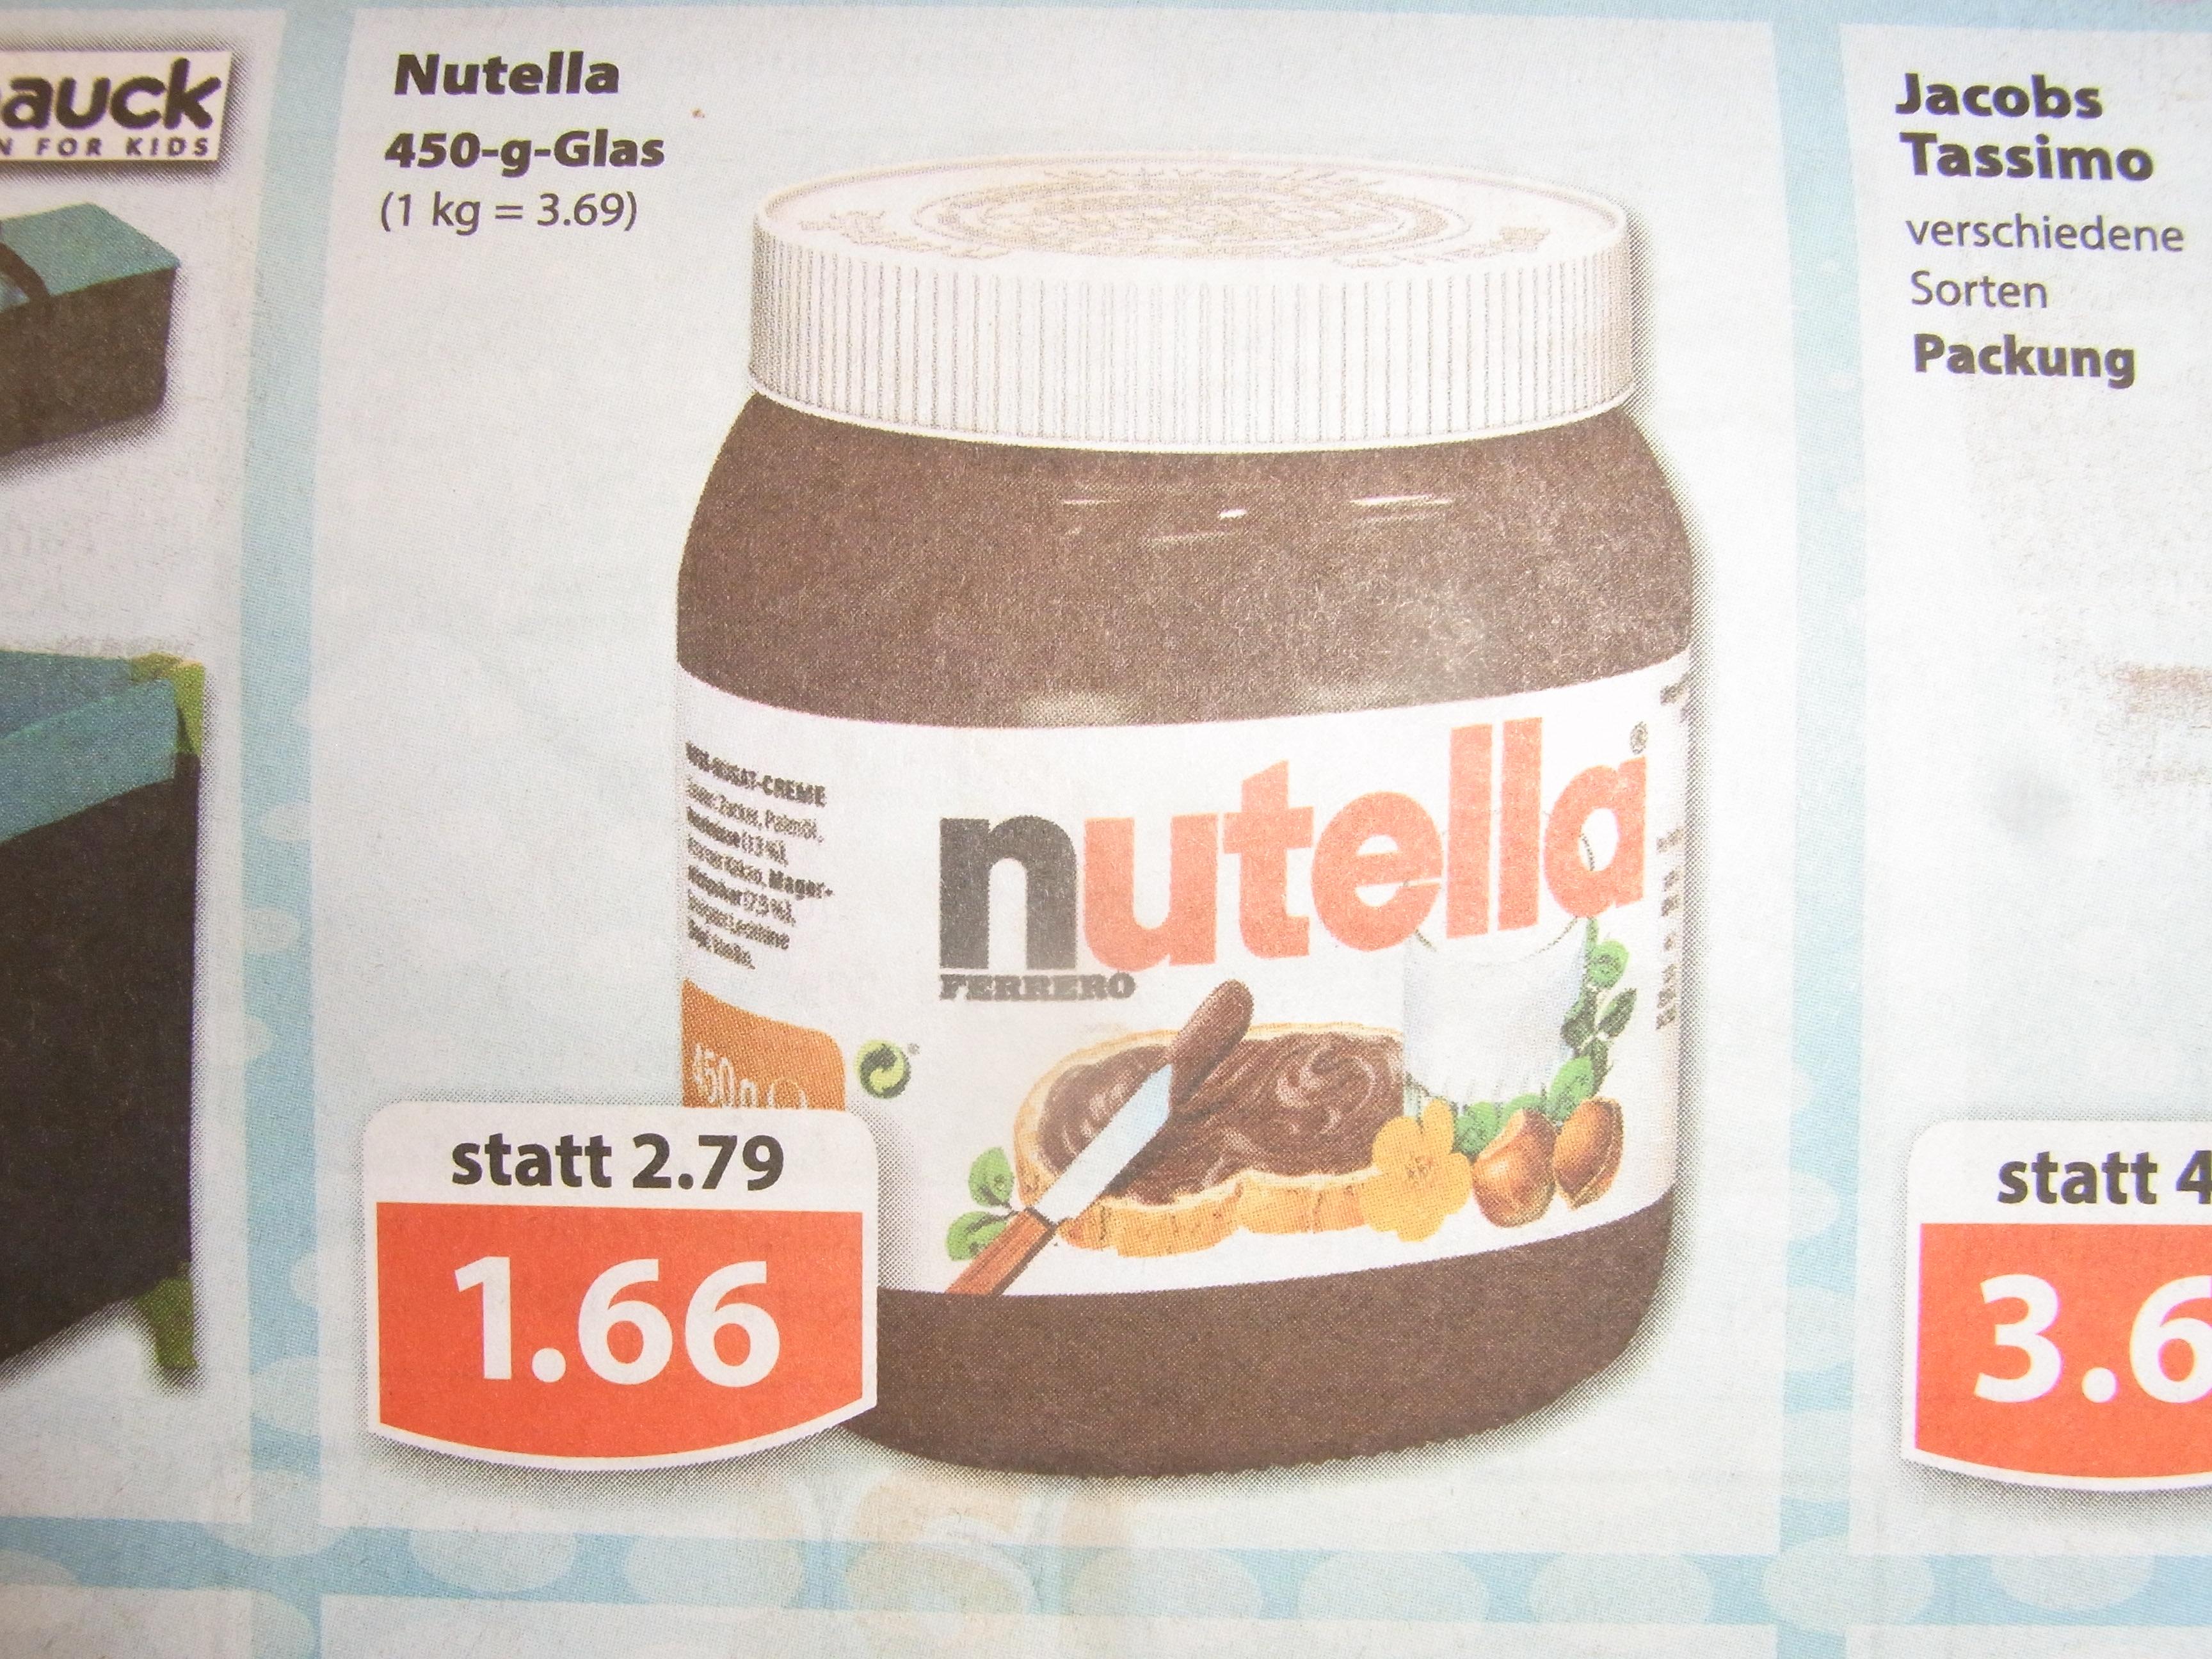 (Lokal) Nutella 450 g Glas  1,66€